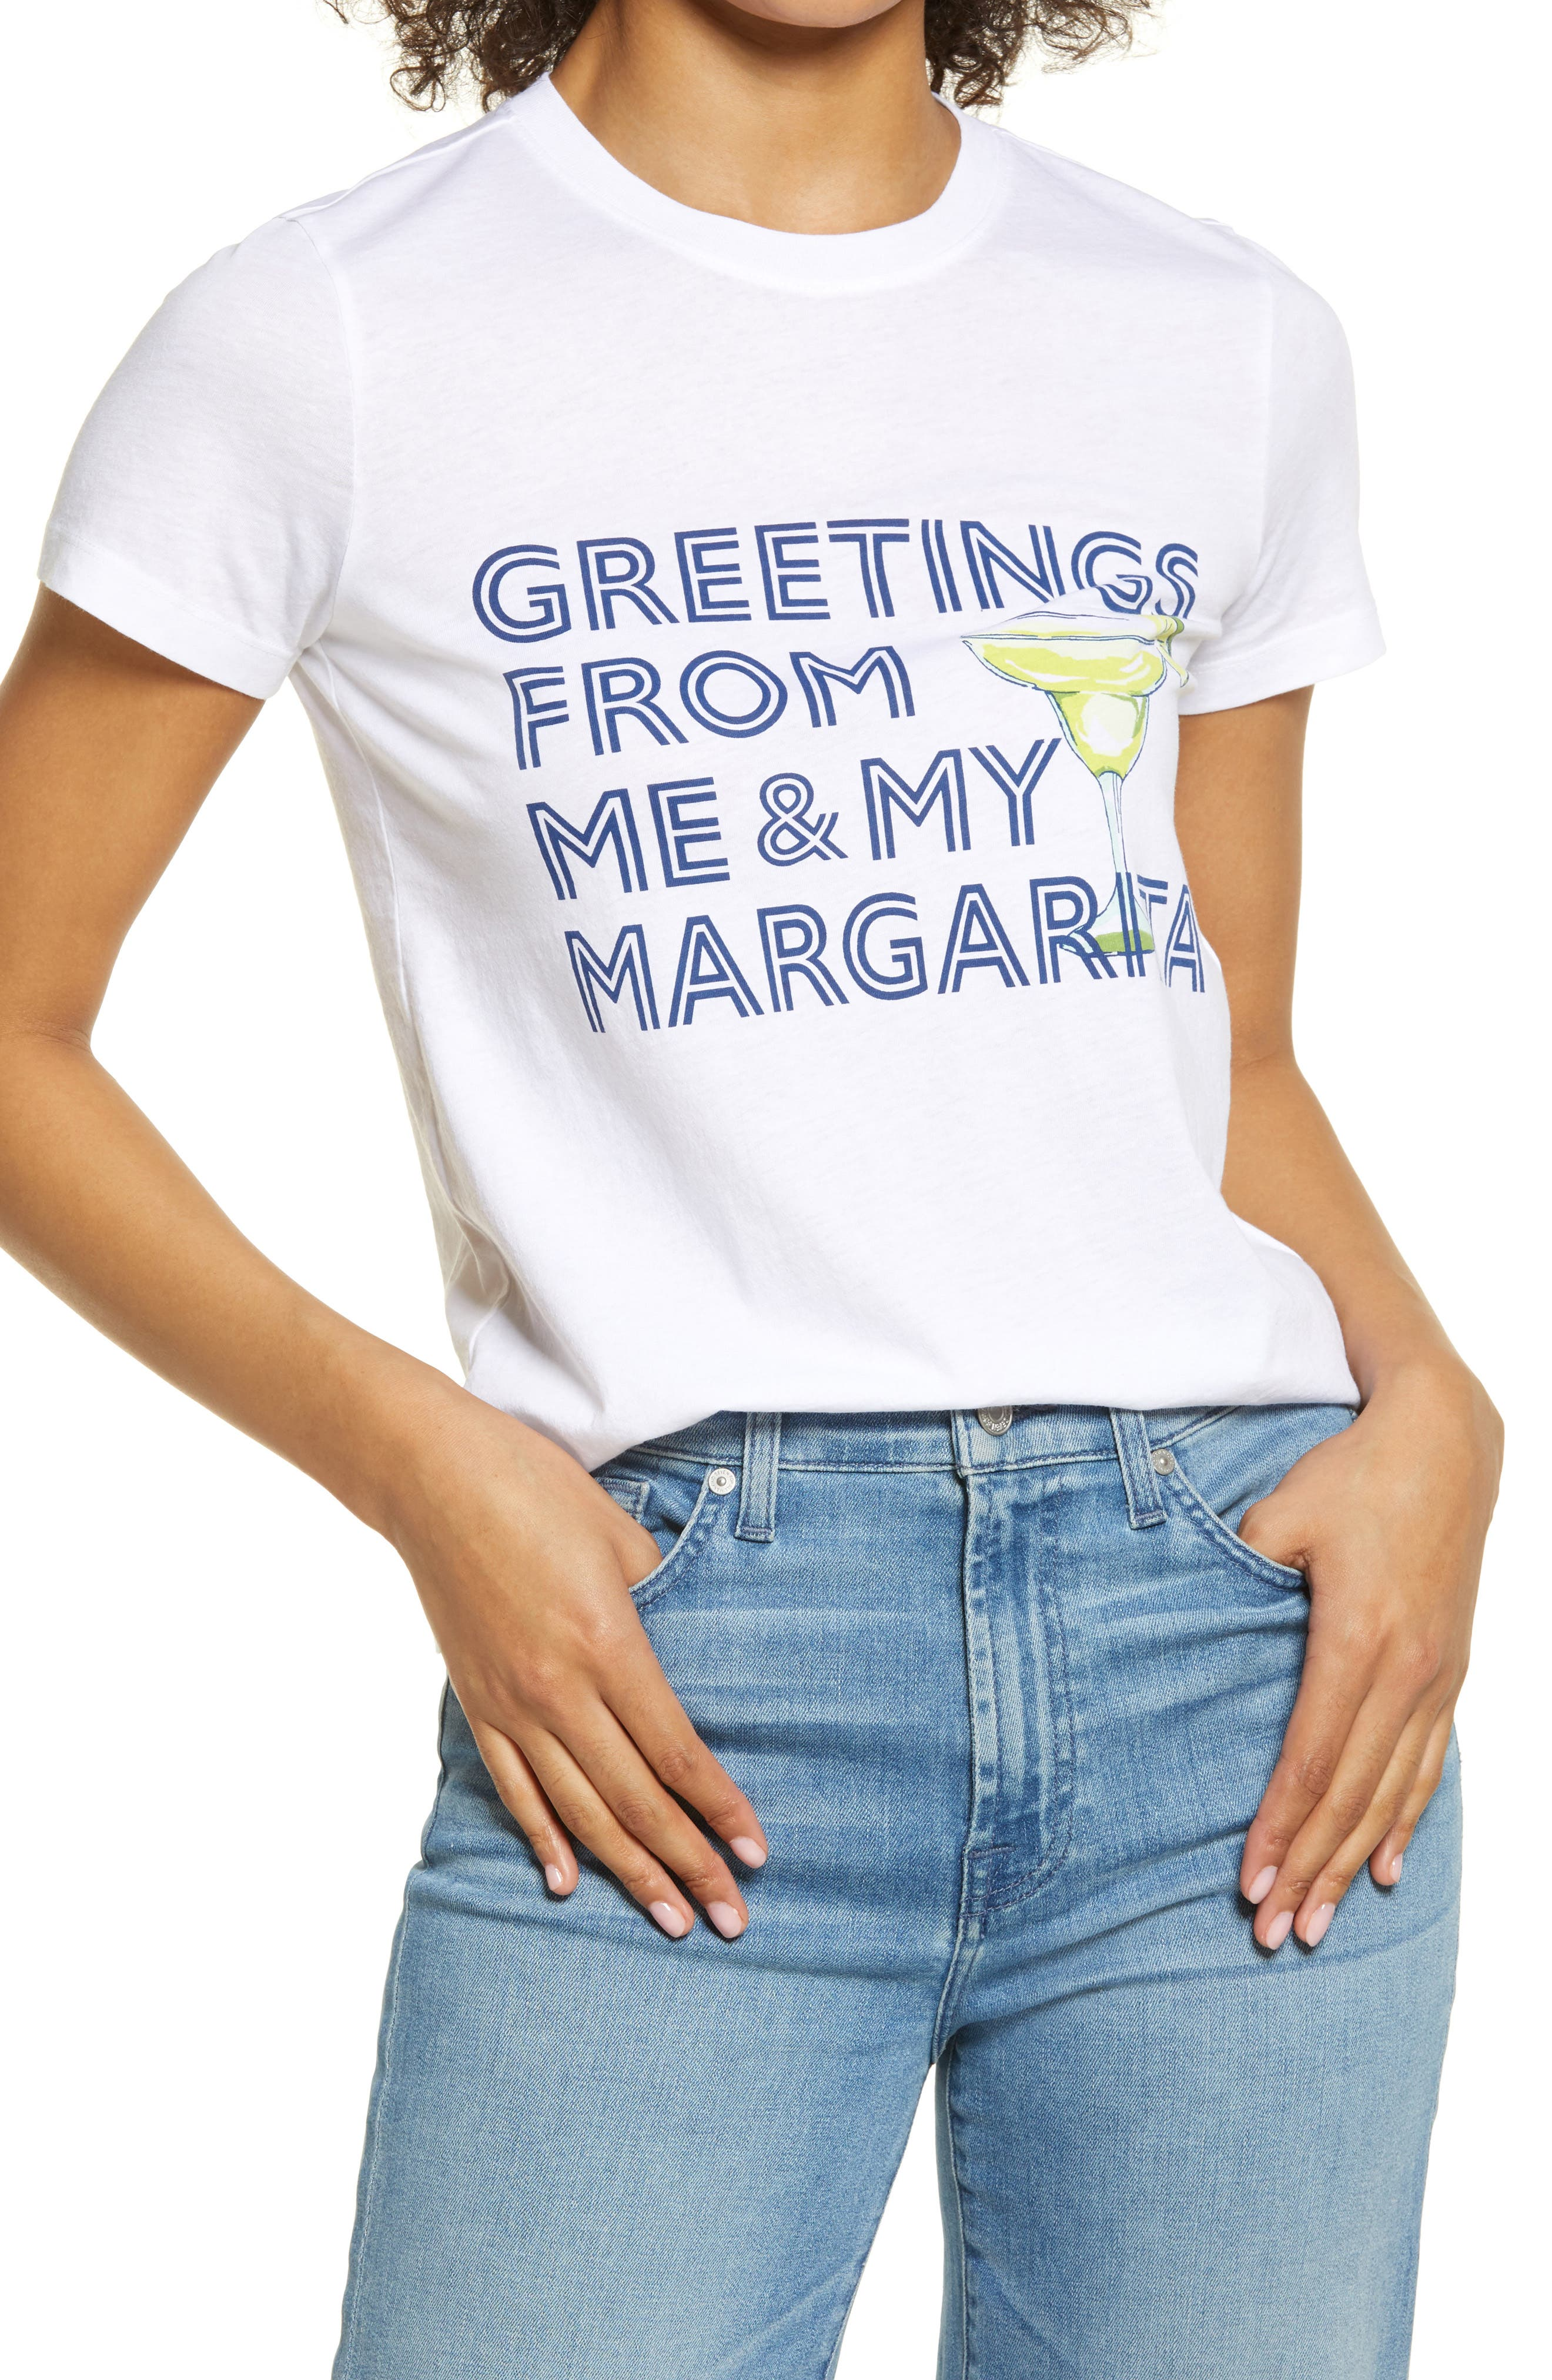 Keith Urban Womens Music Style Band Popular Sleeveless T-Shirt Muscle Shirt Workout T-Shirt Black